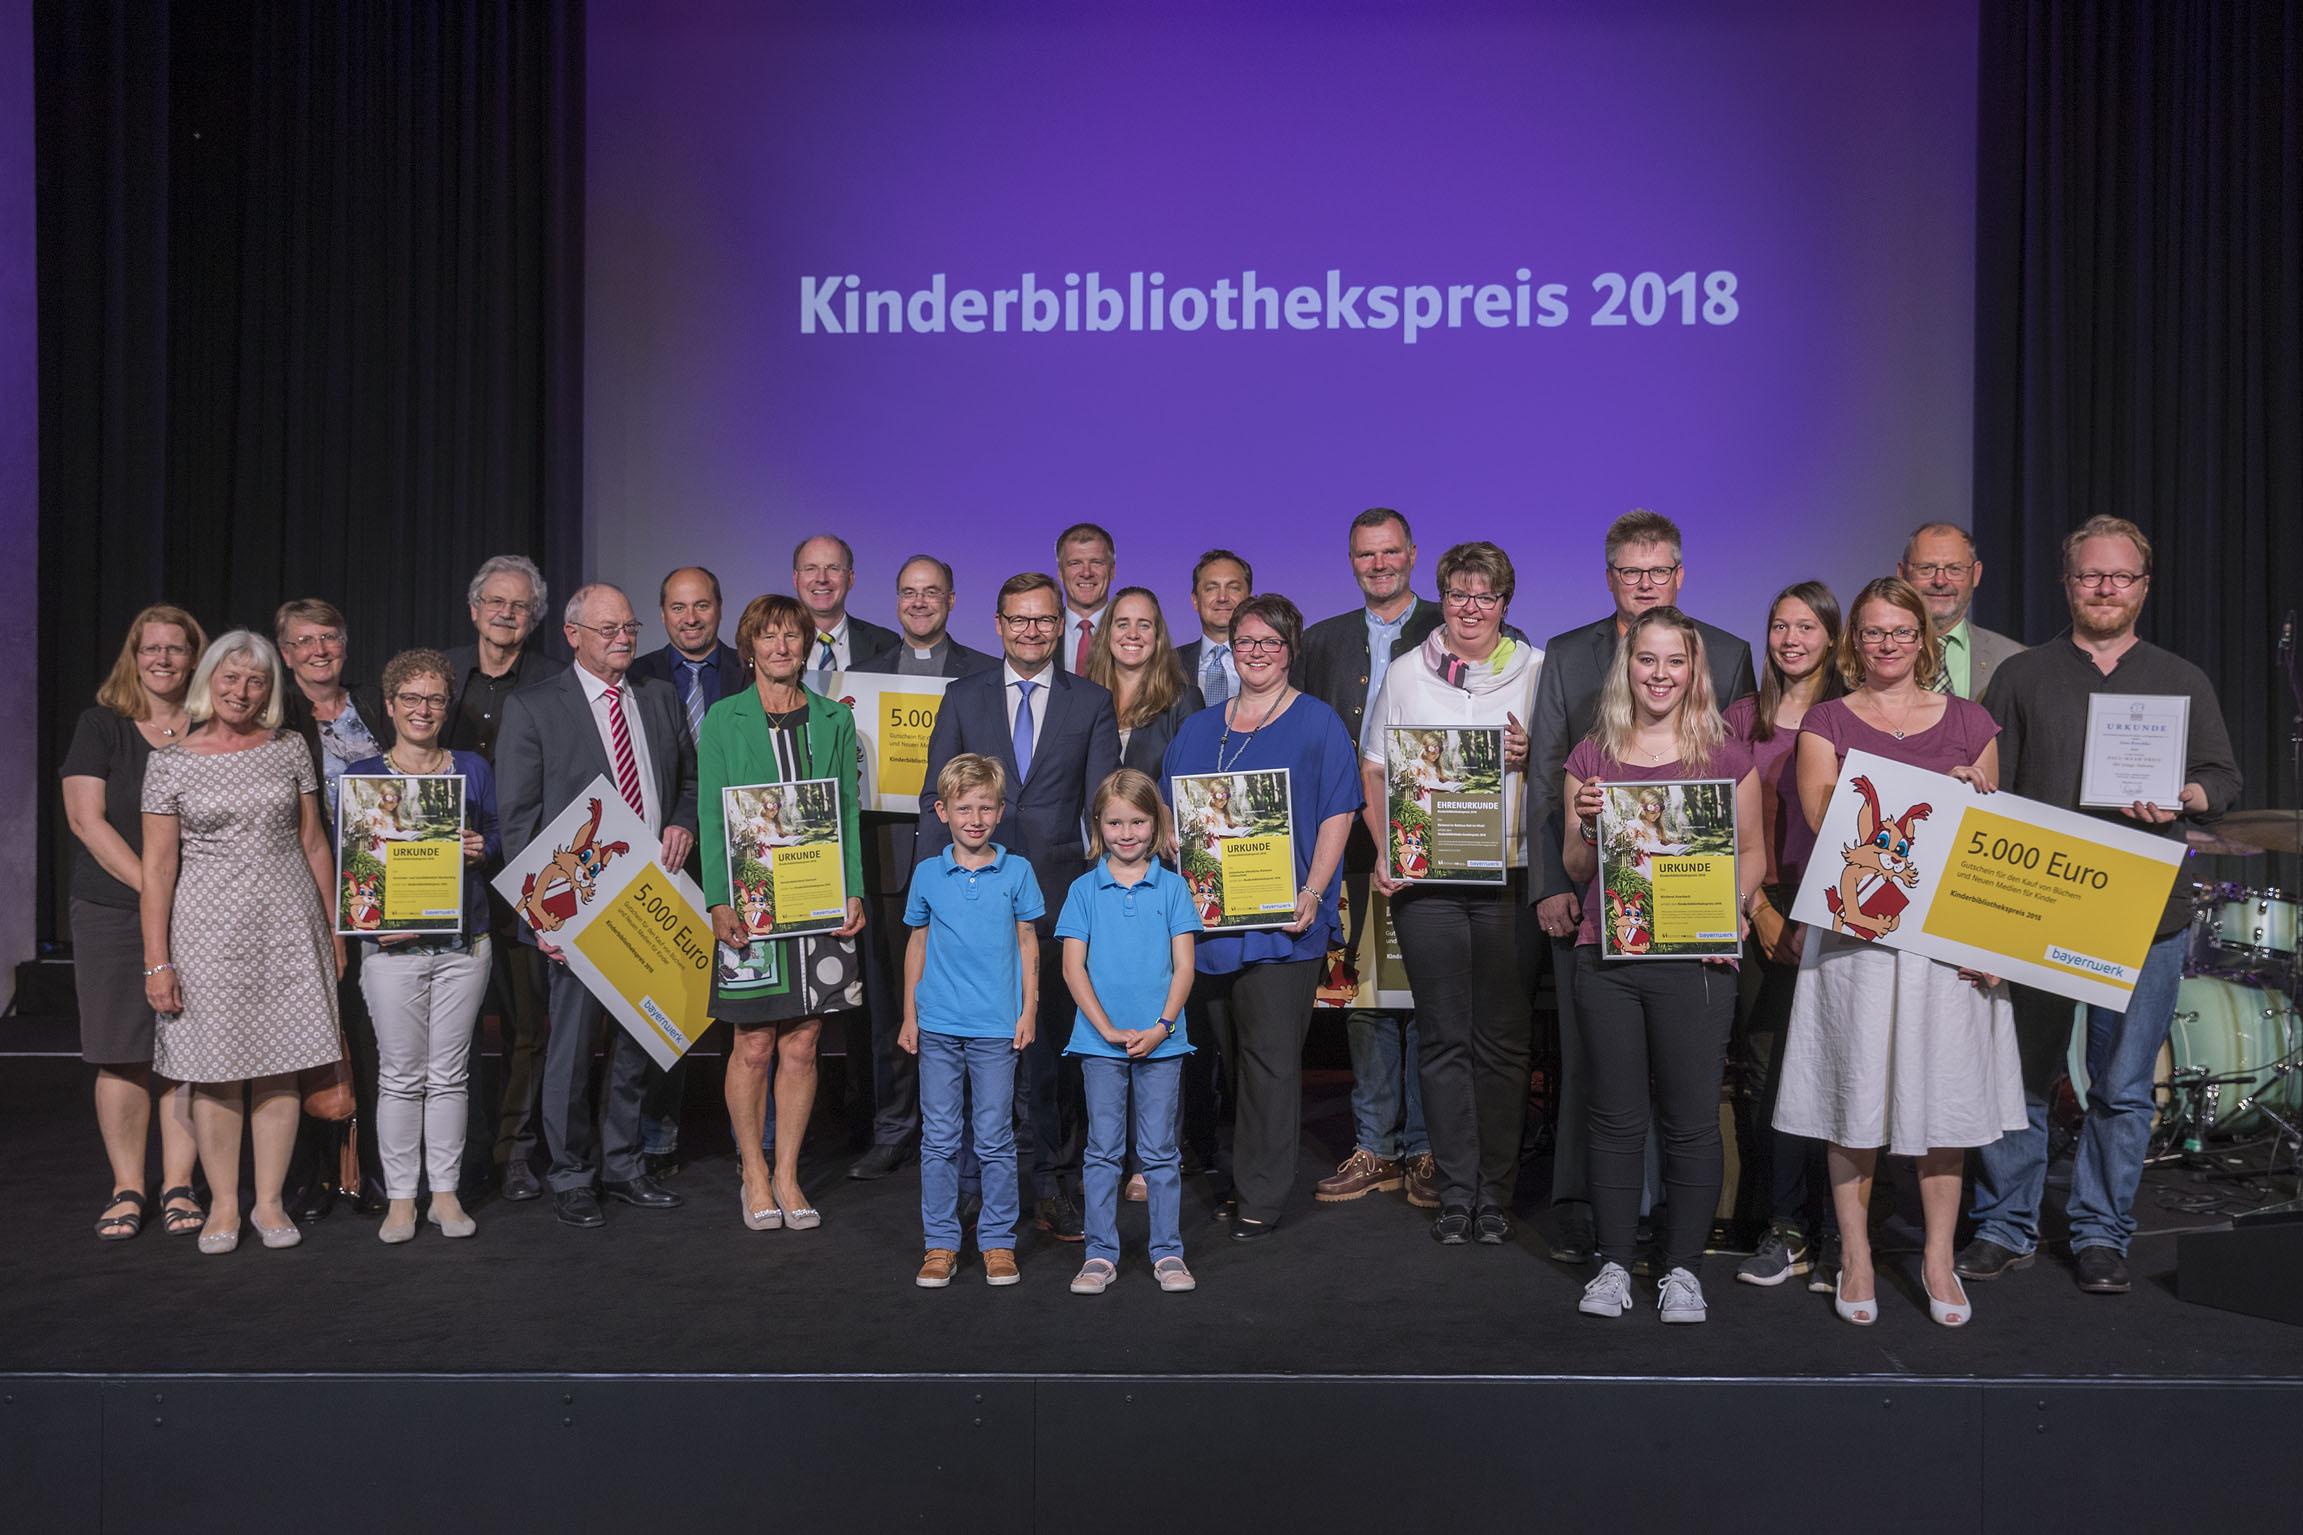 Verleihung Kinderbibliothekspreis 2018 und Paul-Maar-Preis Preisträger Bayernwerk AG Aurelium Lappersdorf Foto: altrofoto.de